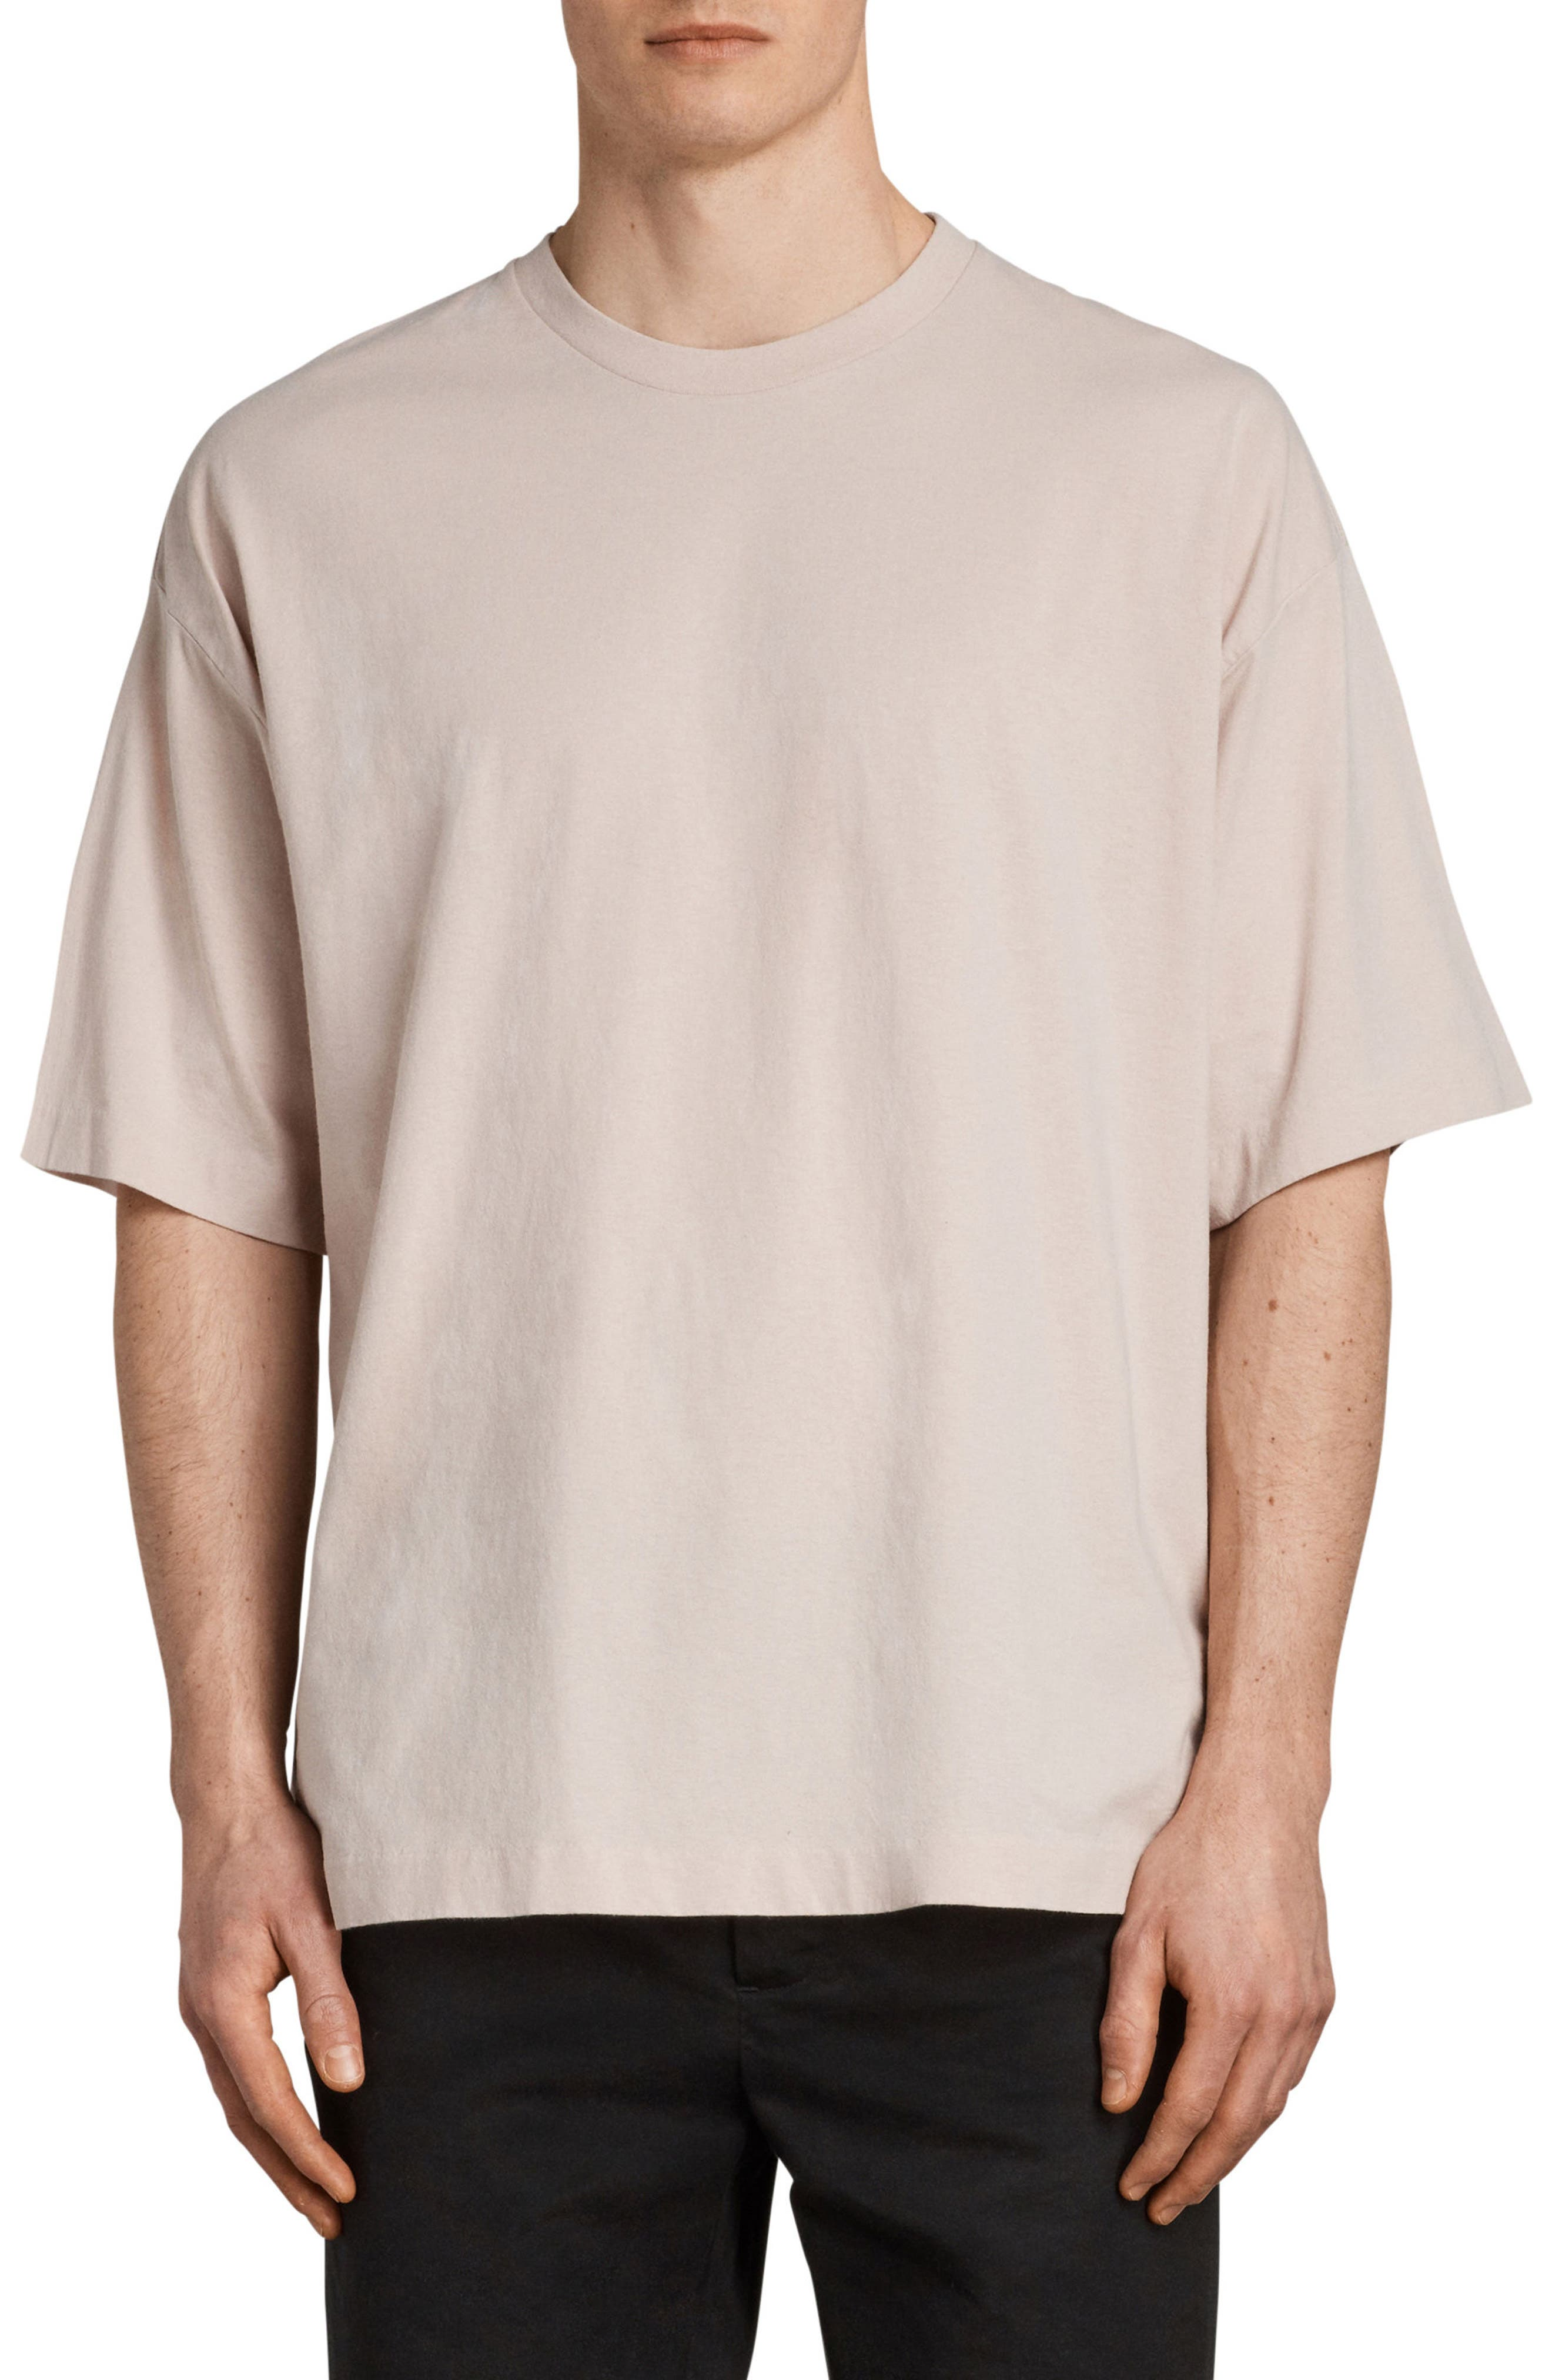 Atnom Crewneck T-Shirt,                             Main thumbnail 1, color,                             River Pink